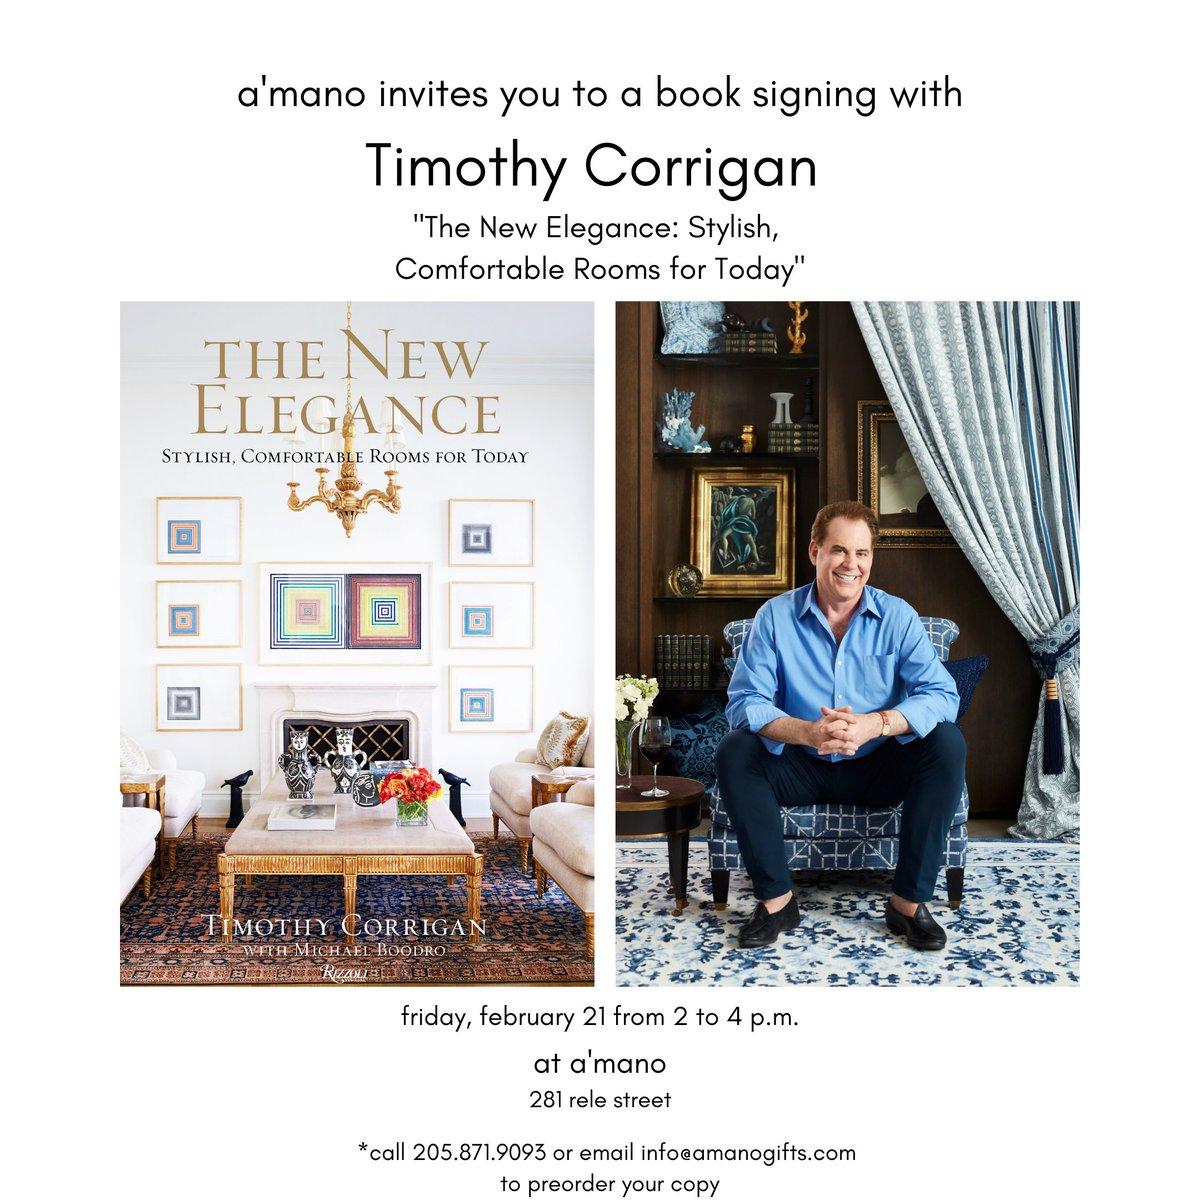 "Hey Birmingham! Join me at @amano_bham this Friday Feb 21 from 2-4 PM where I'll be signing copies of my new book ""The New Elegance"" @rizzolibooks #amanobham #amanogifts #mountainbrook #mountainbrookvillage #inbham #instagrambham #birmingham #interiordesignerpic.twitter.com/FEkmlzlkXH"